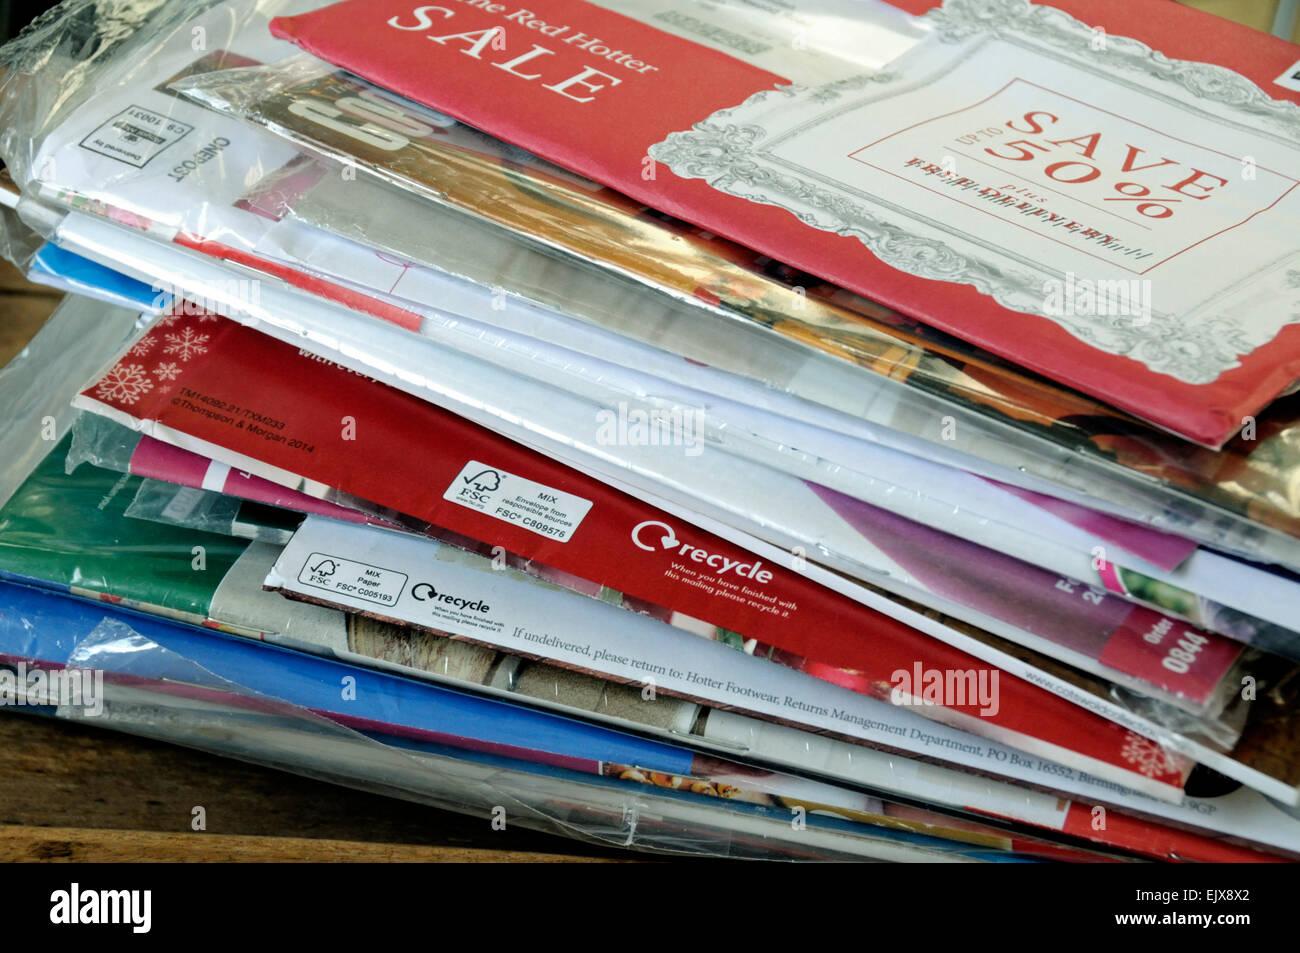 Pile of unopened envelopes containing clothing catalogues London, UK - Stock Image